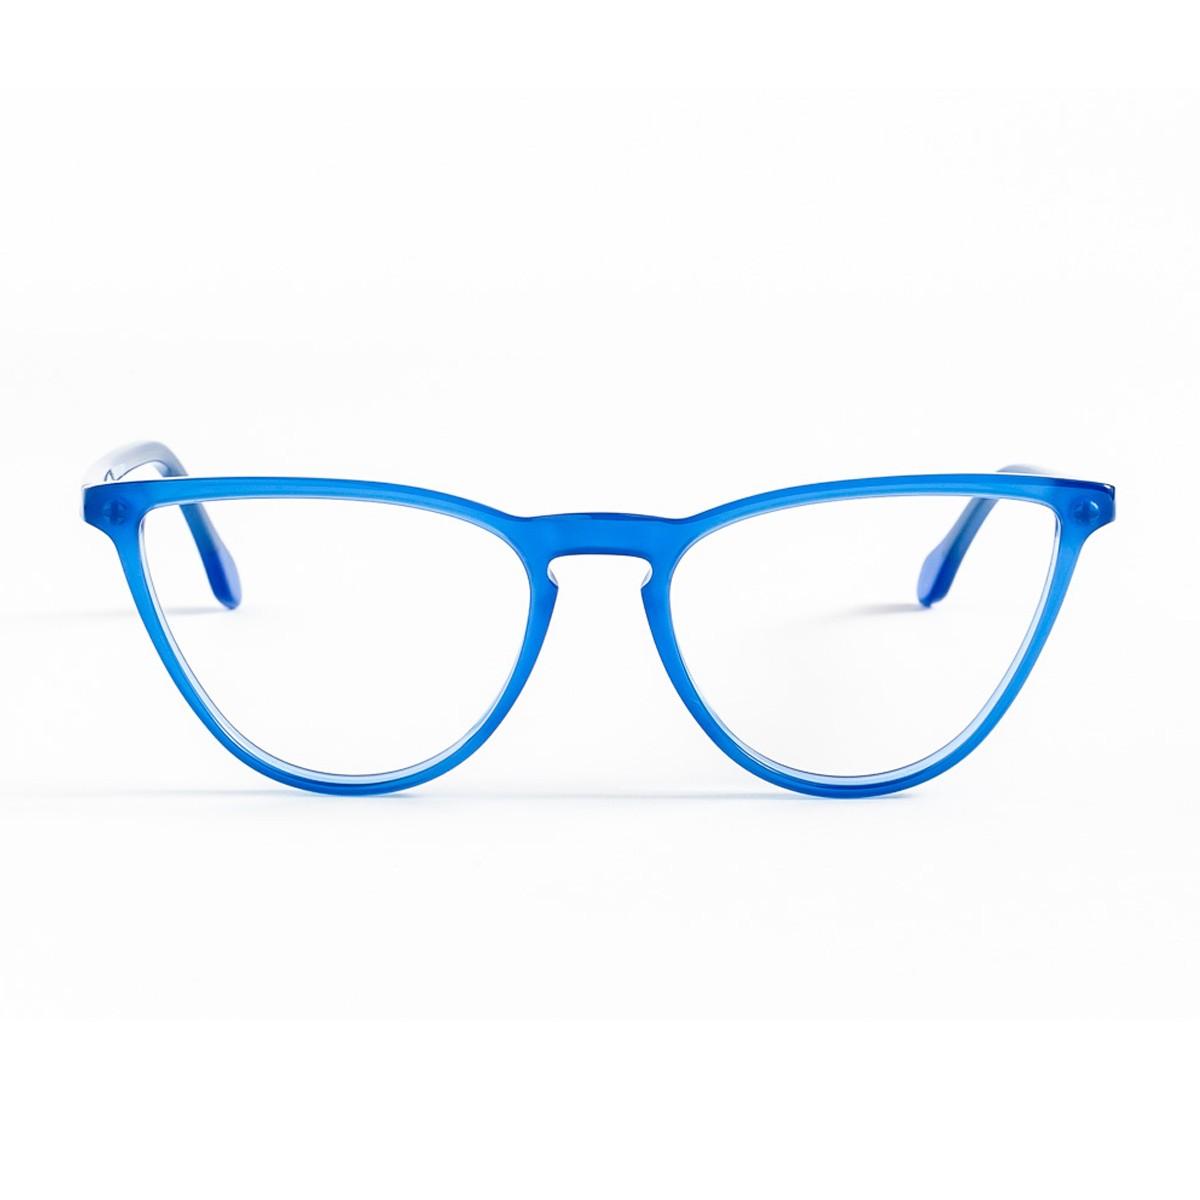 Germano Gambini GG120 | Women's eyeglasses